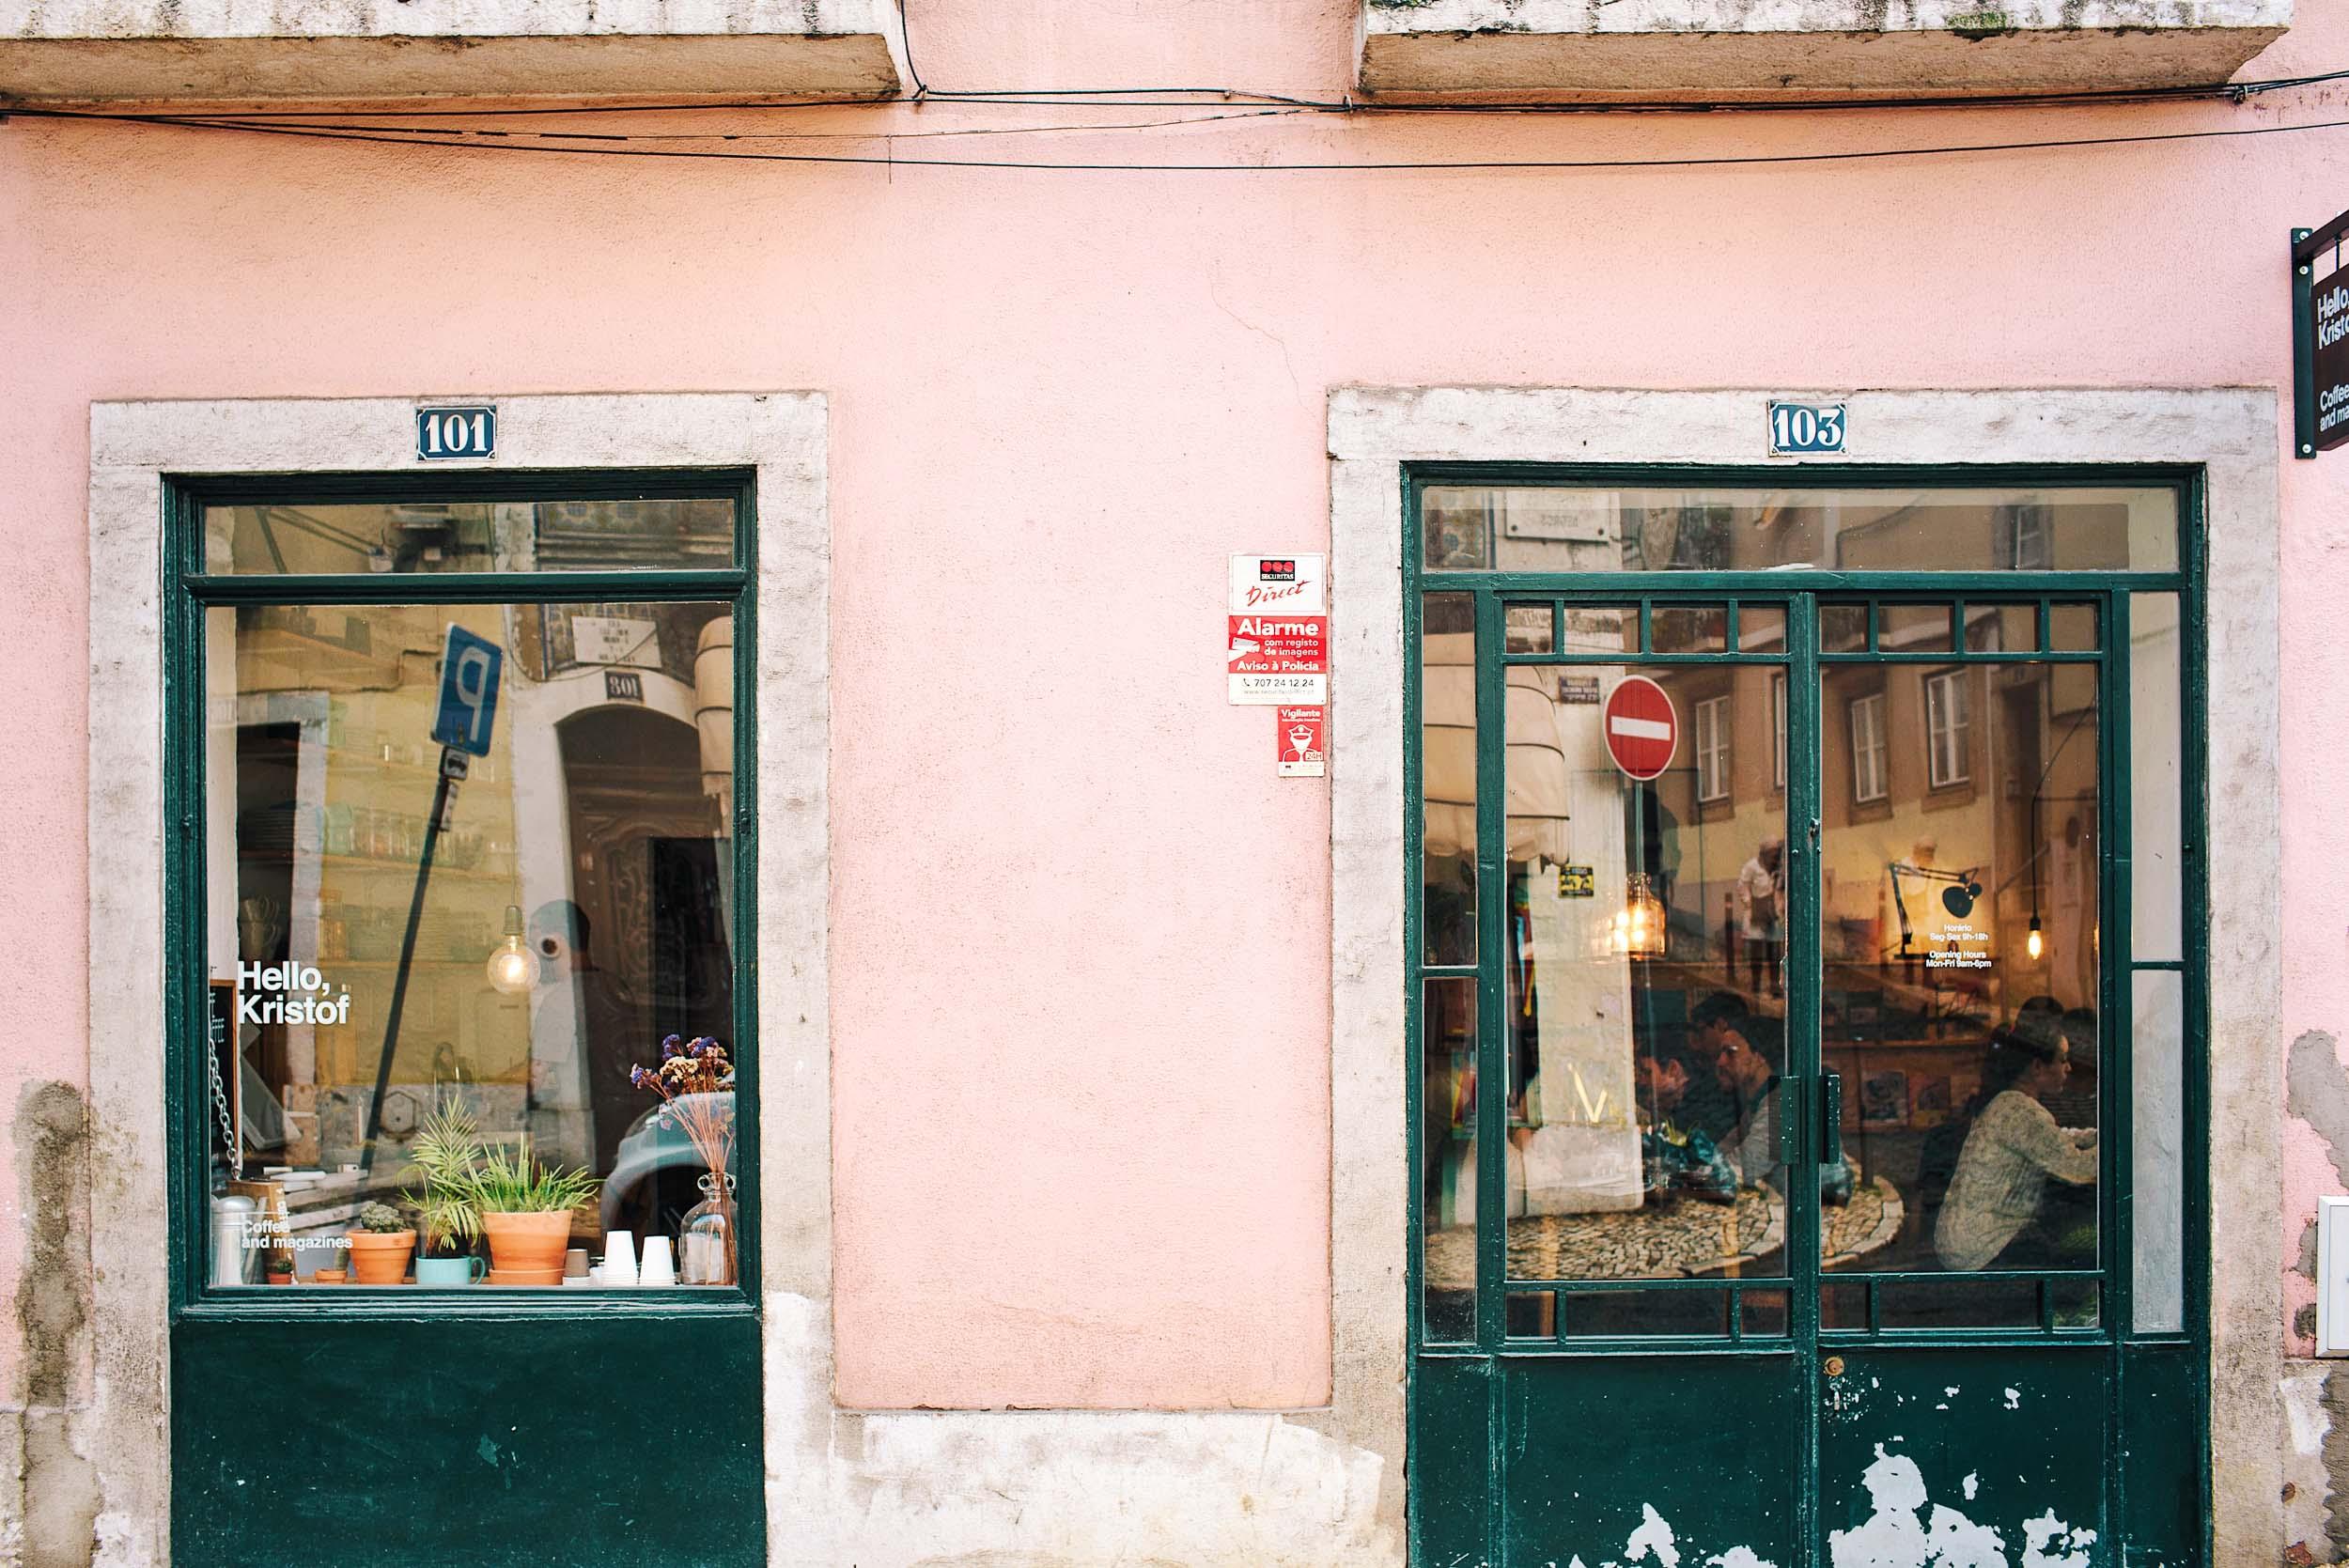 Hello, Kristof - an excellent coffee shop in Bairro Alto, Lisbon, Portugal